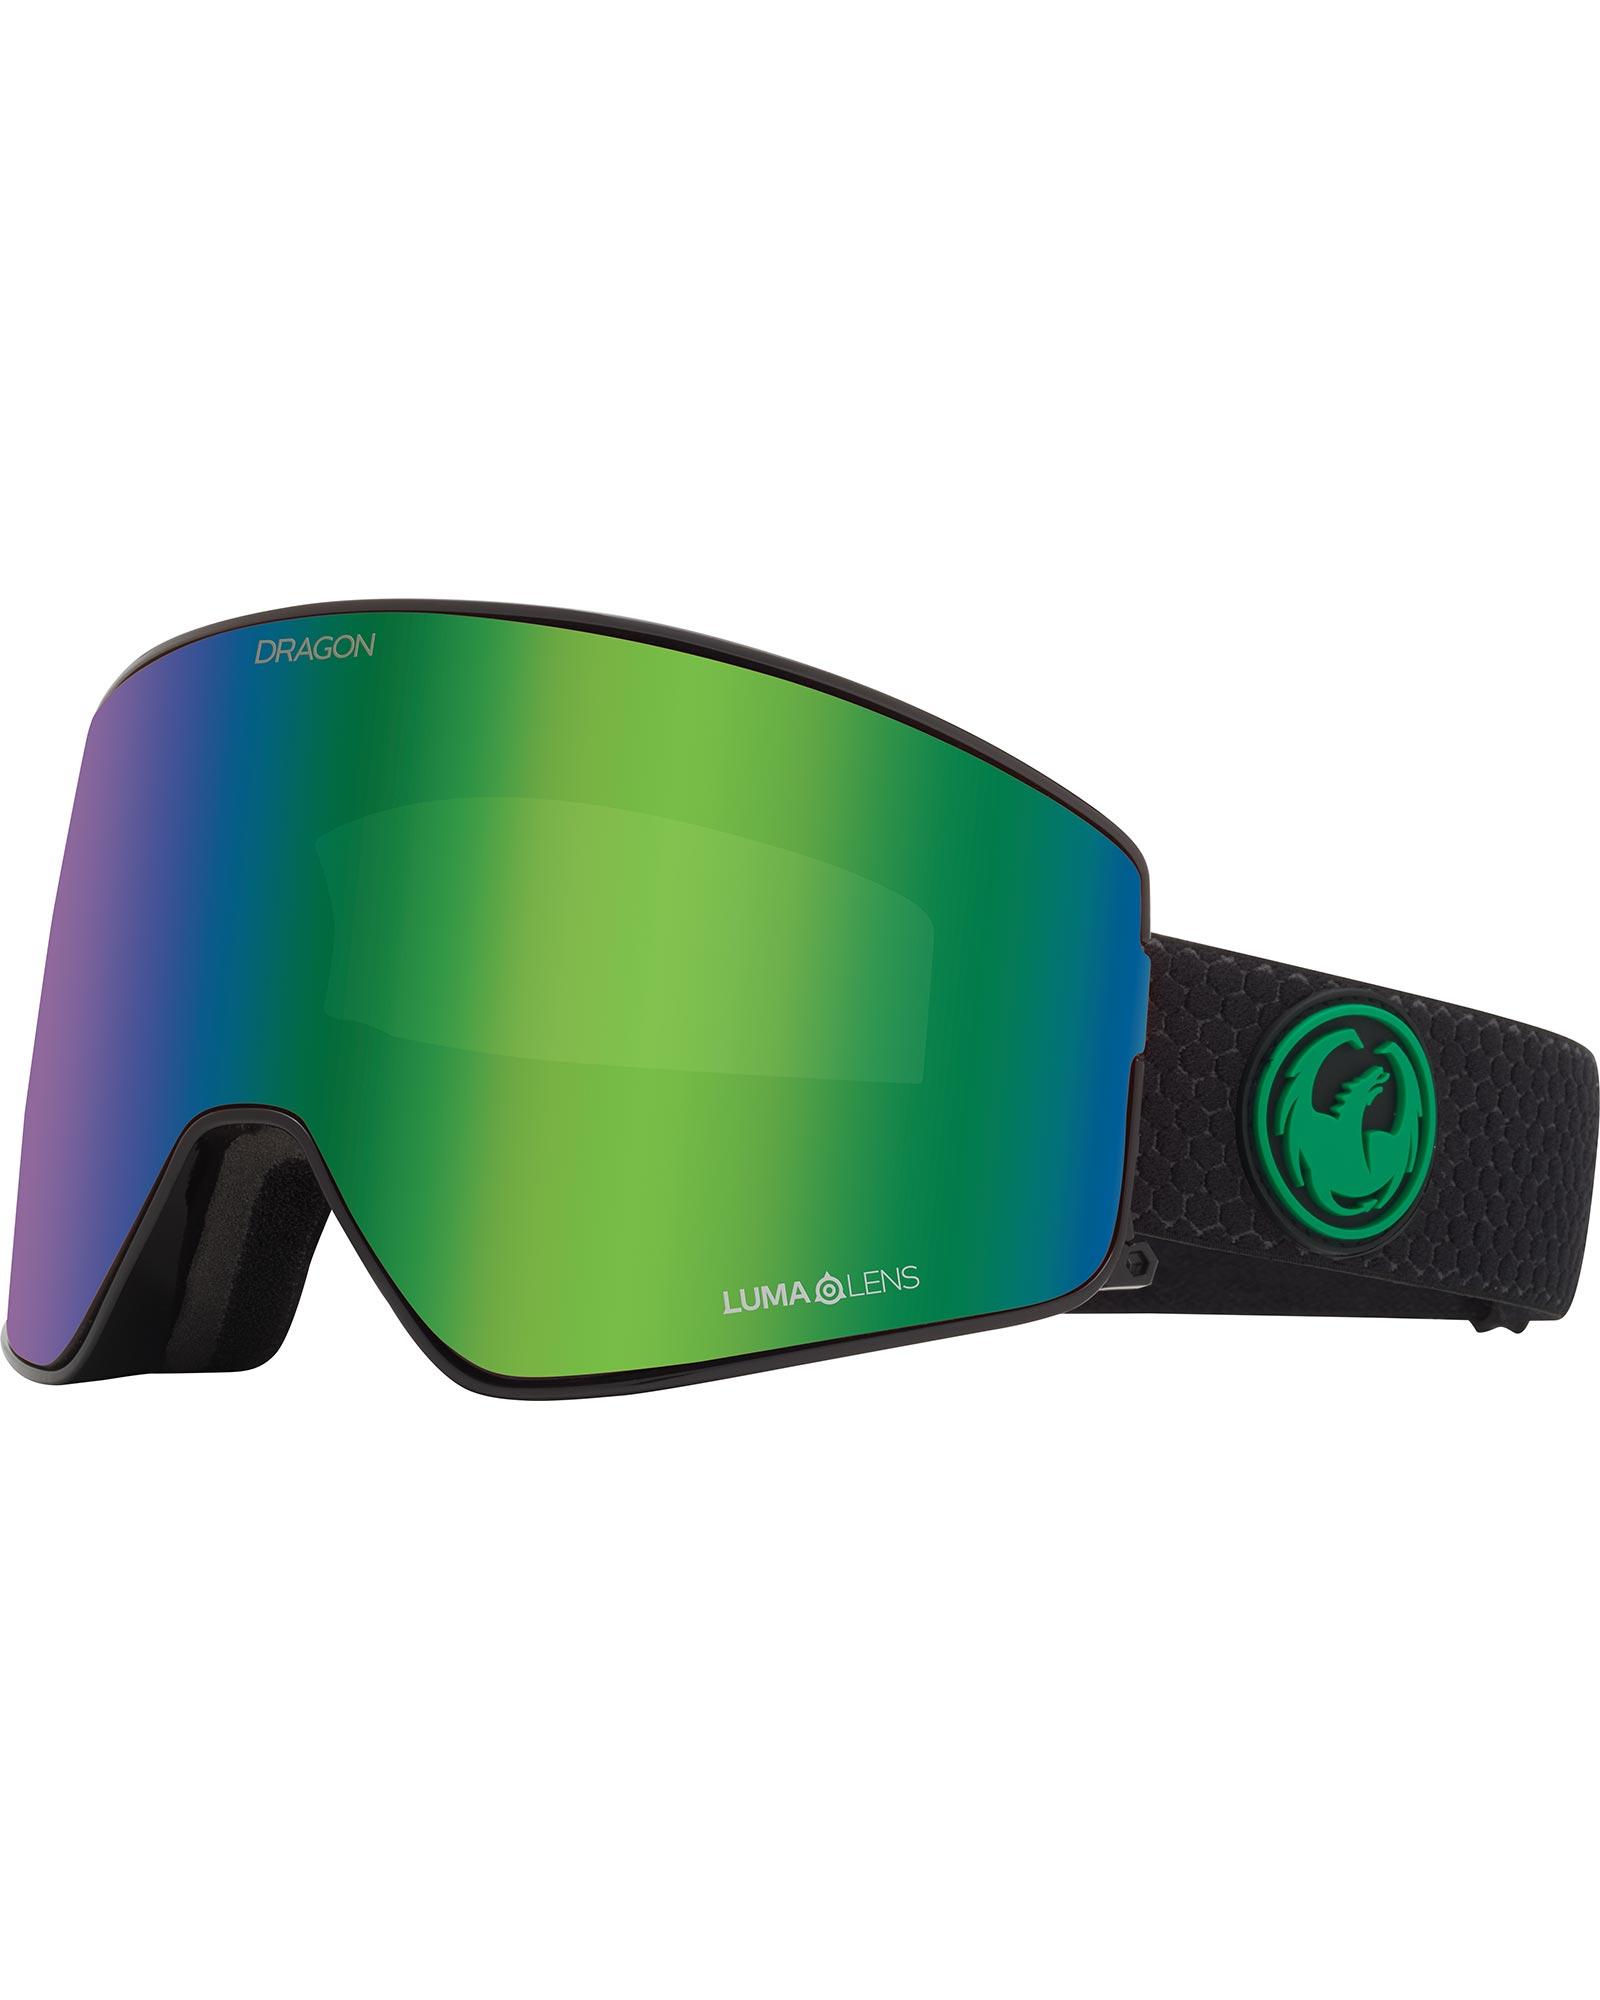 Dragon PXV2 Split / Lumalens Green Ionized + Lumalens Amber Goggles 2019 / 2020 0